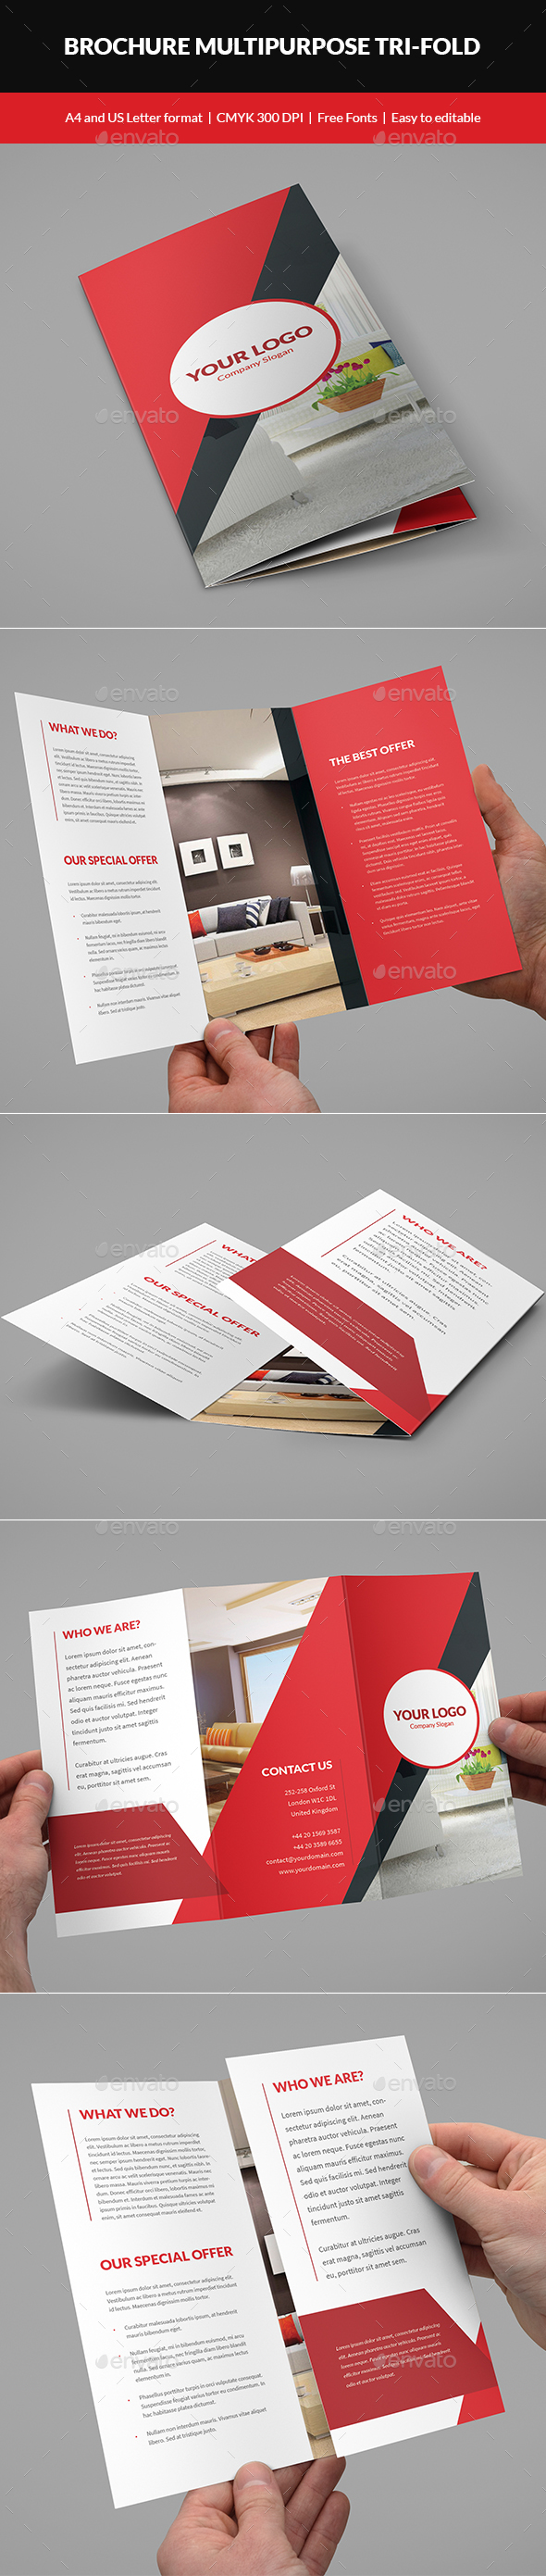 Brochure Multipurpose Tri-Fold - Corporate Brochures